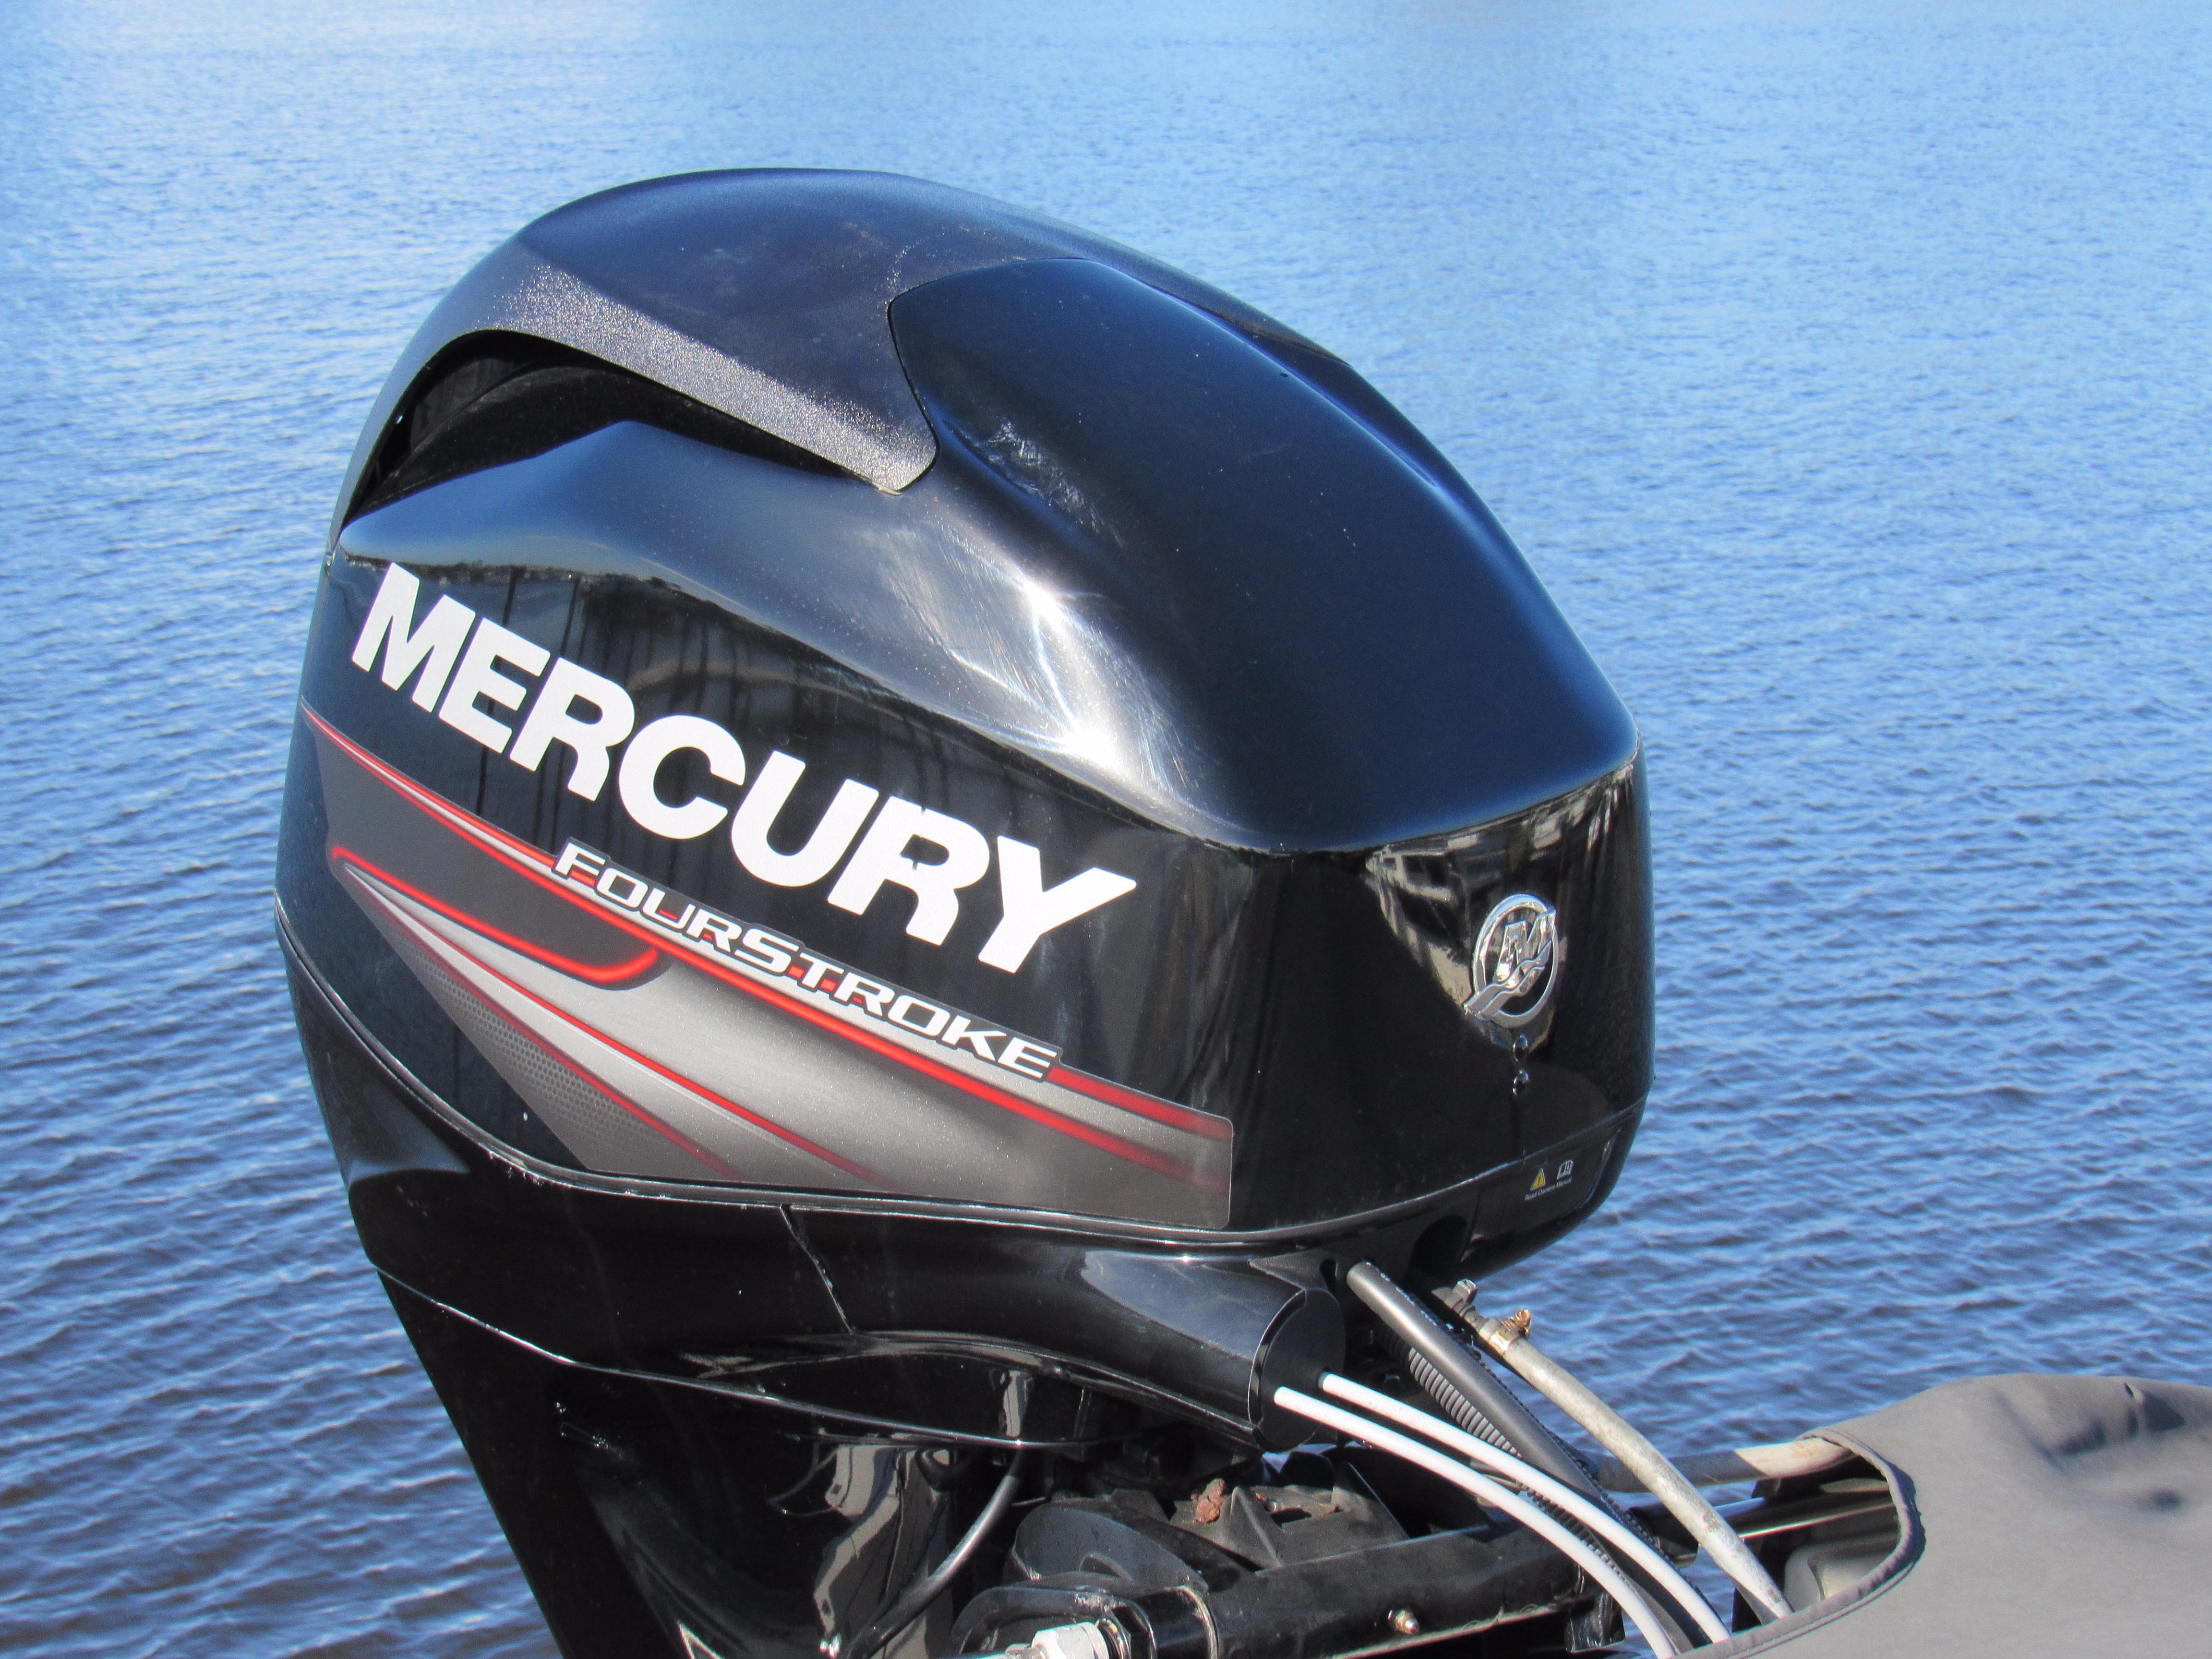 40 hp Mercury